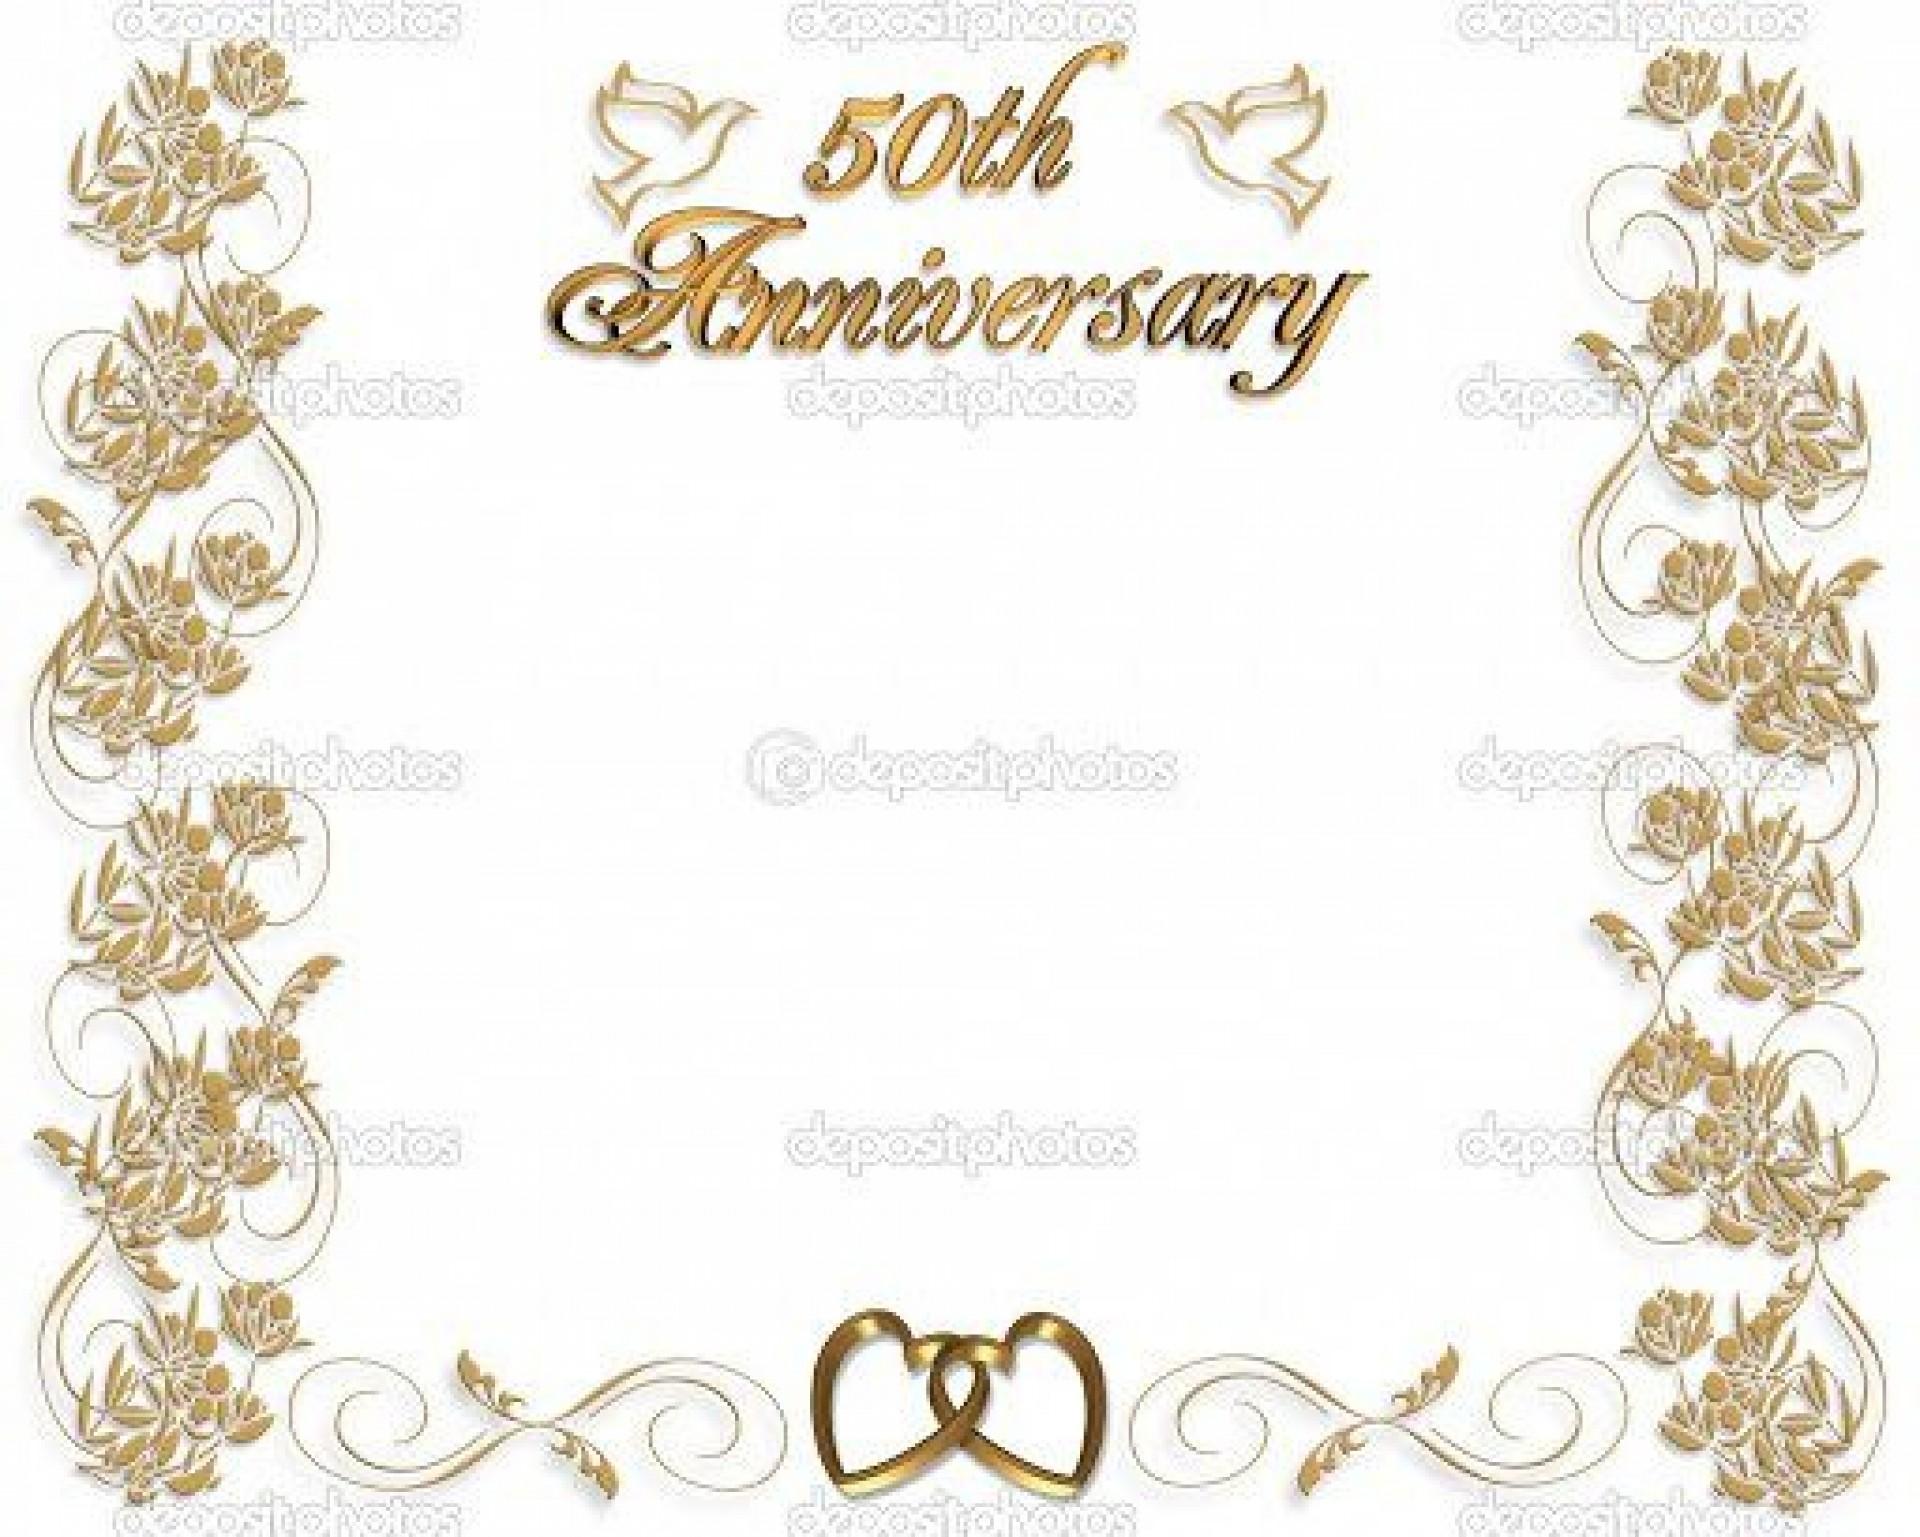 005 Impressive 50th Wedding Anniversary Invitation Template Microsoft Word Idea  Free1920